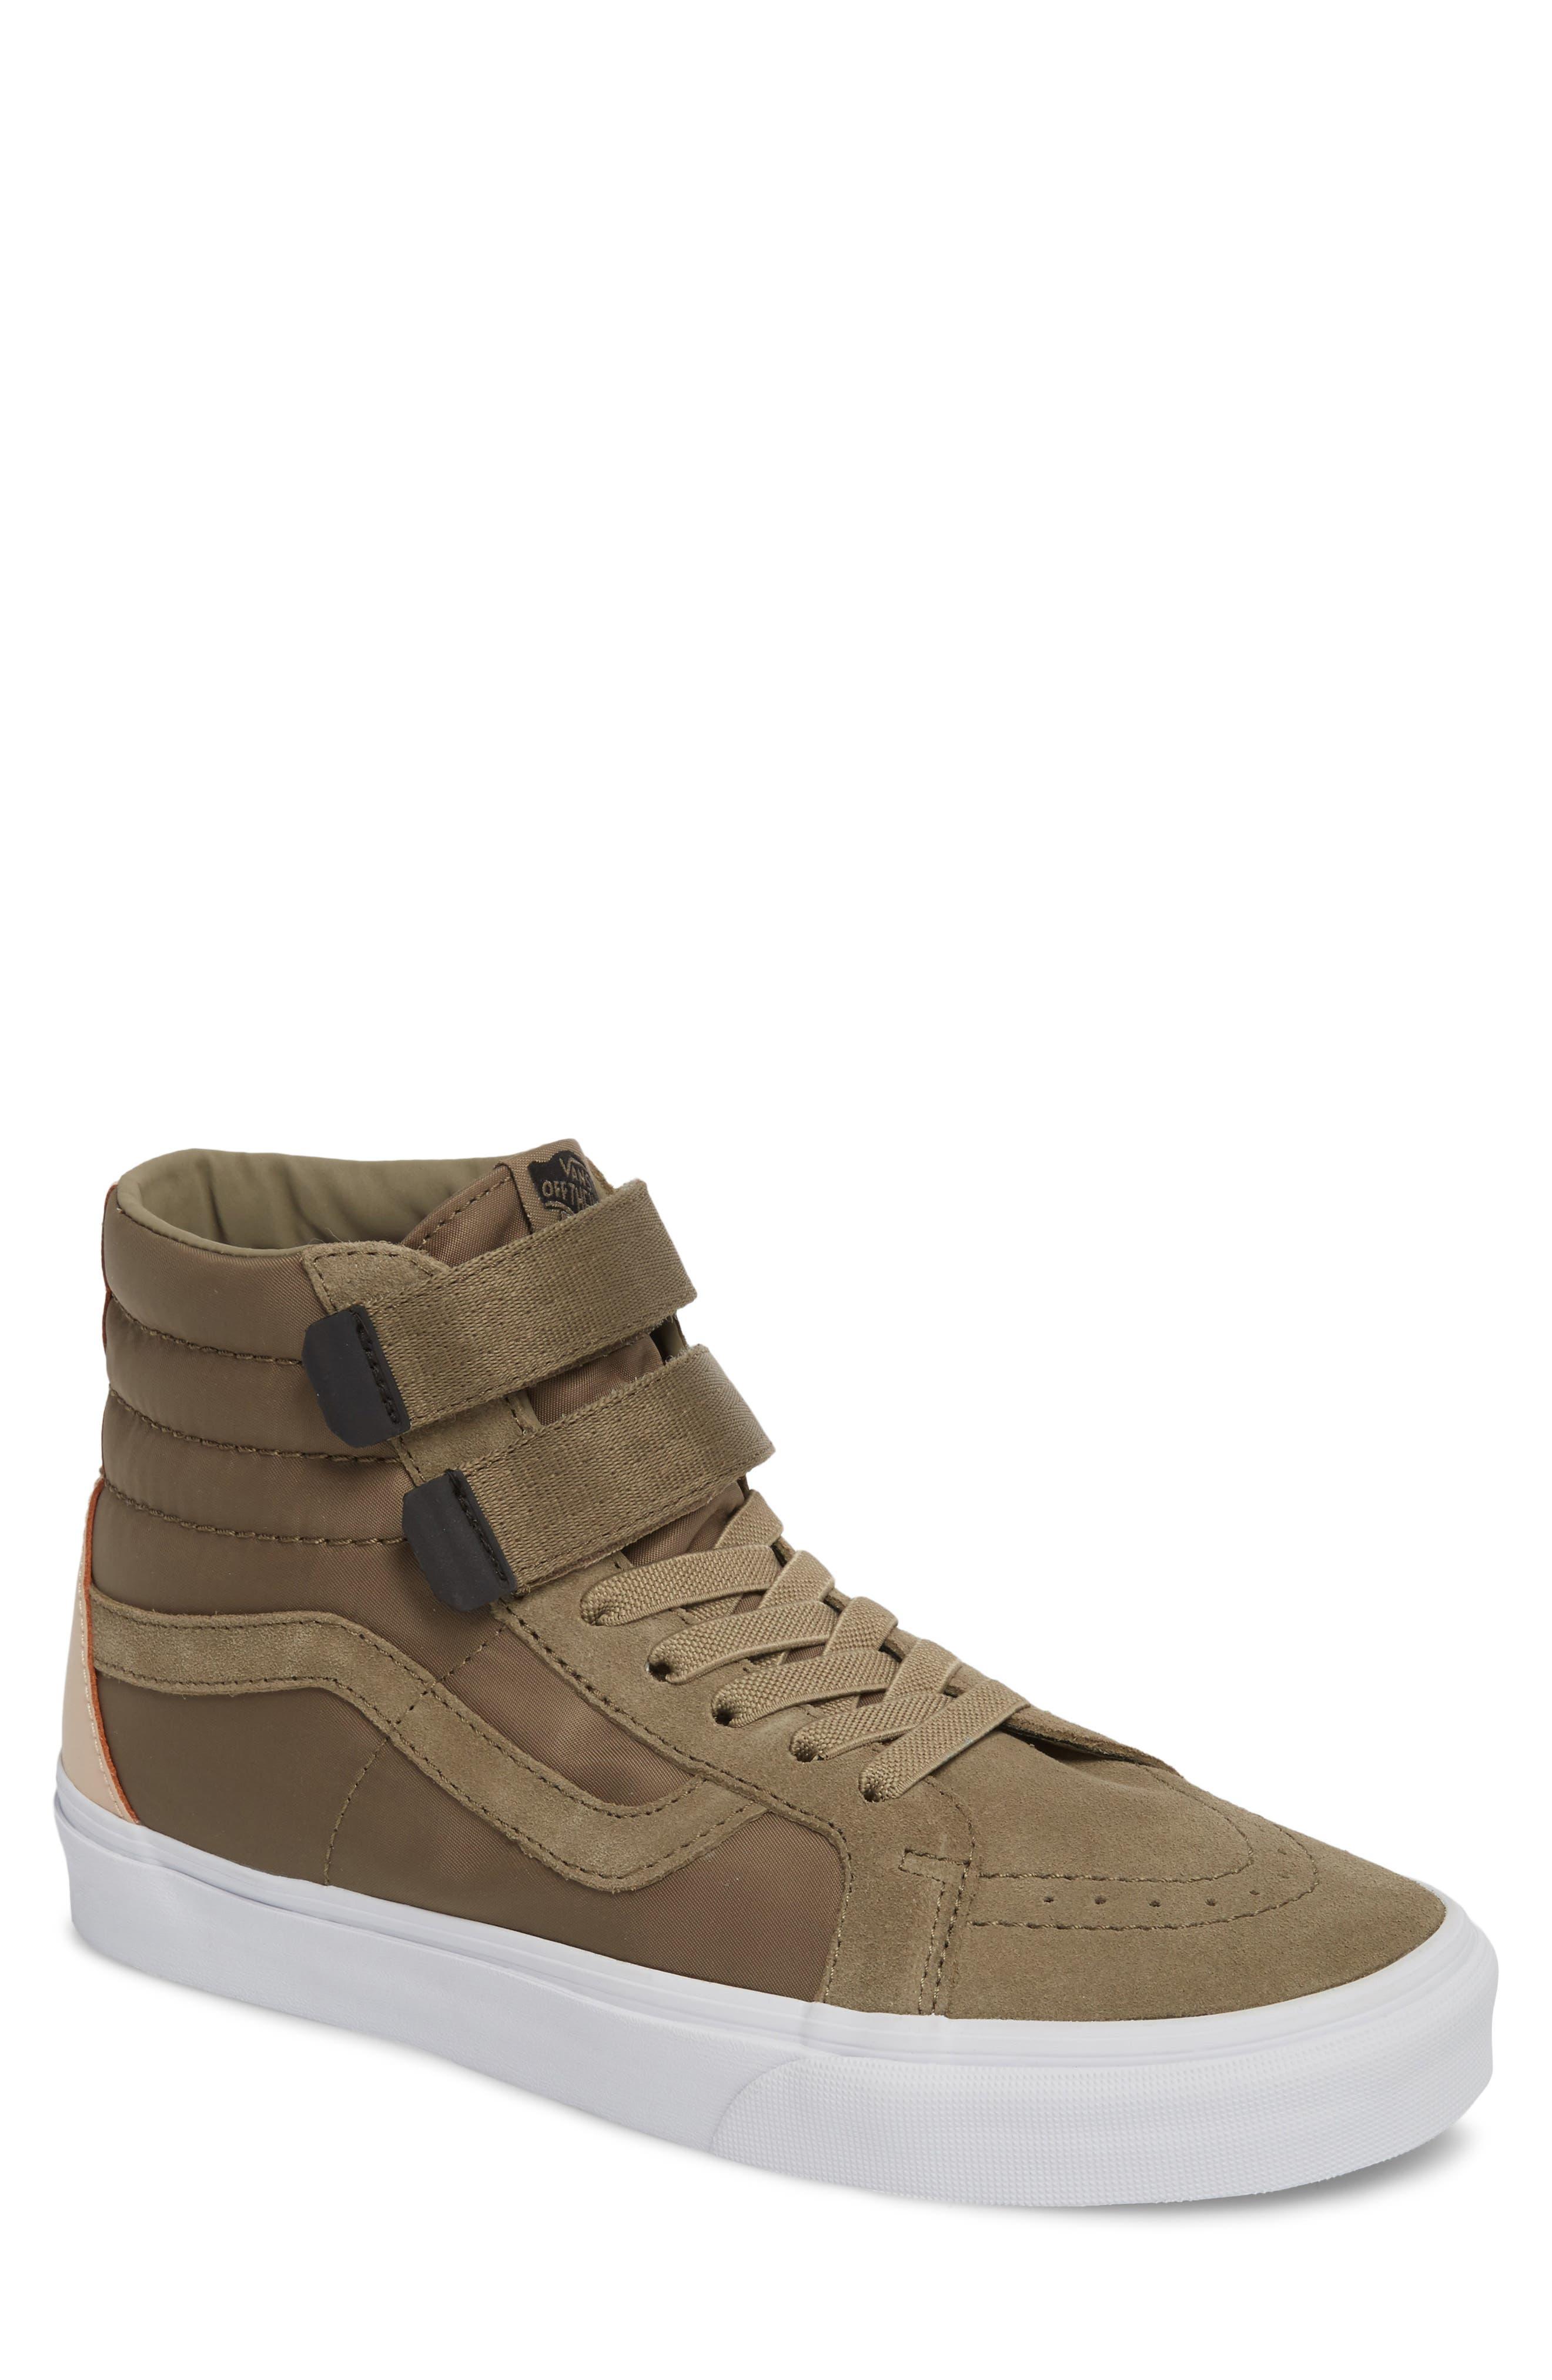 Sk8-Hi Reissue V Sneaker,                         Main,                         color, Dusky Green Leather